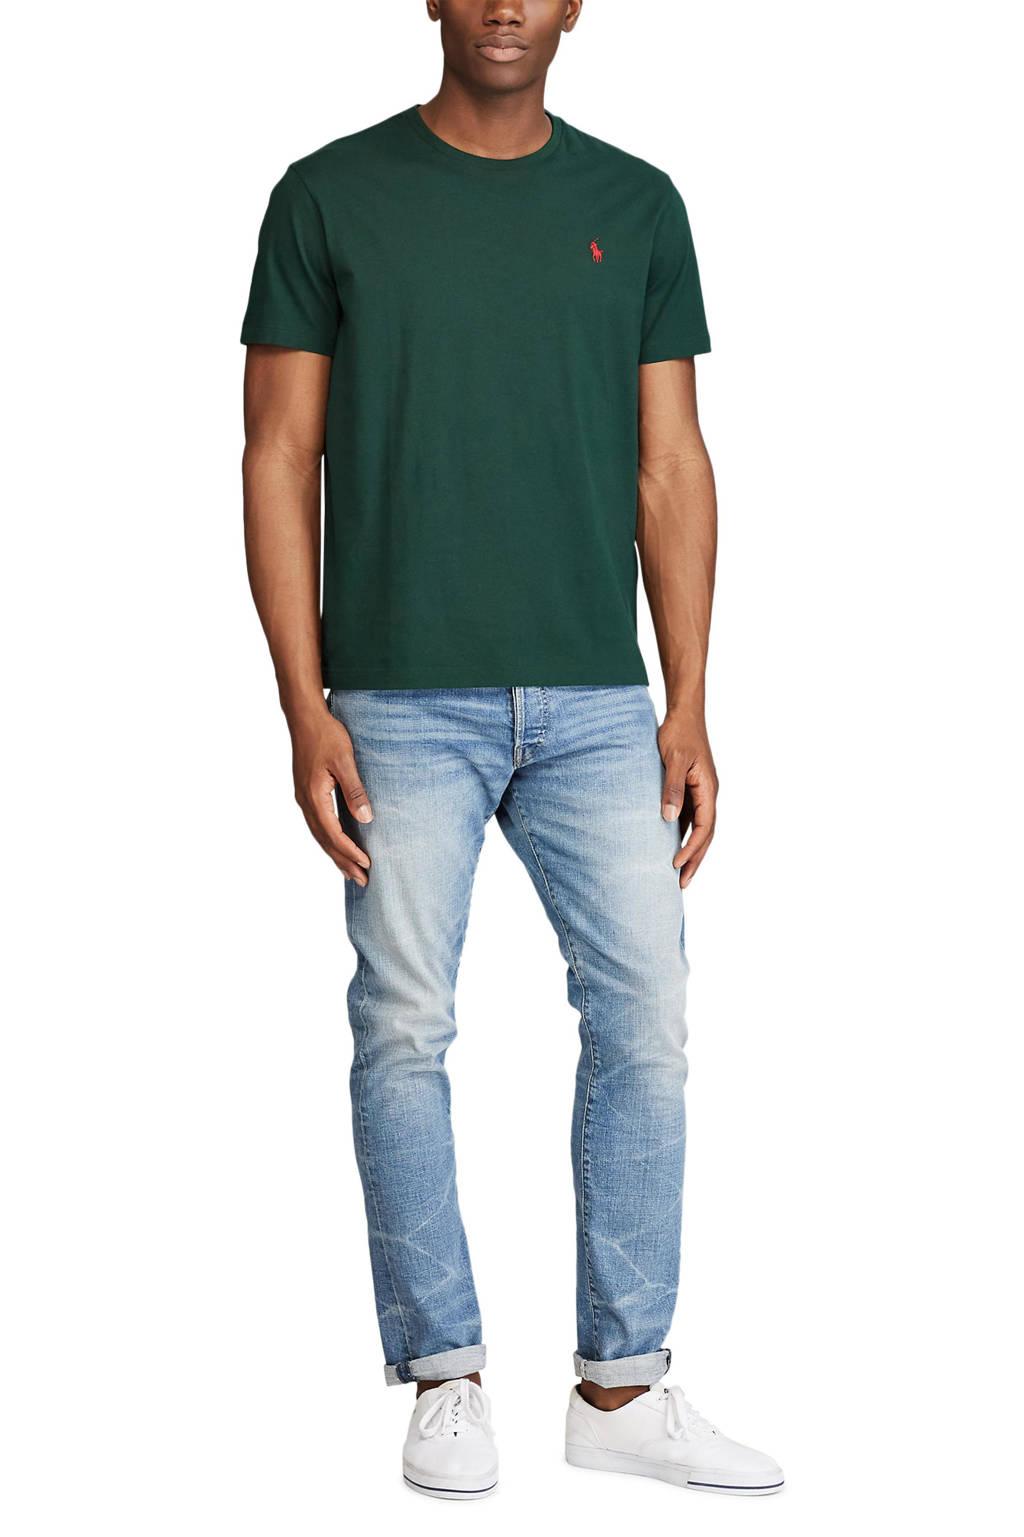 POLO Ralph Lauren T-shirt donkergroen, Donkergroen